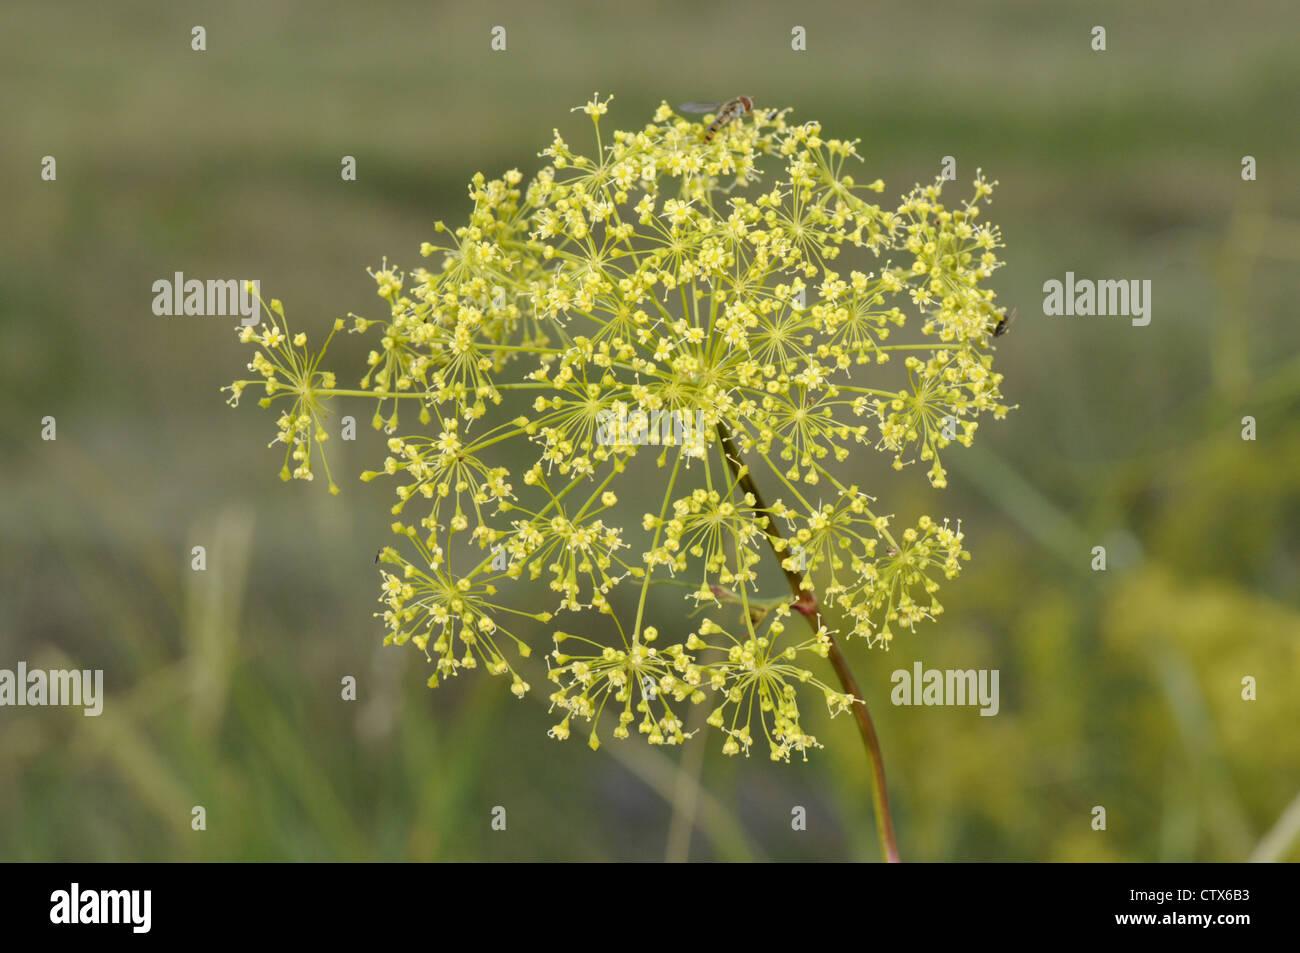 HOG'S FENNEL Peucedanum officinale (Apiaceae) - Stock Image